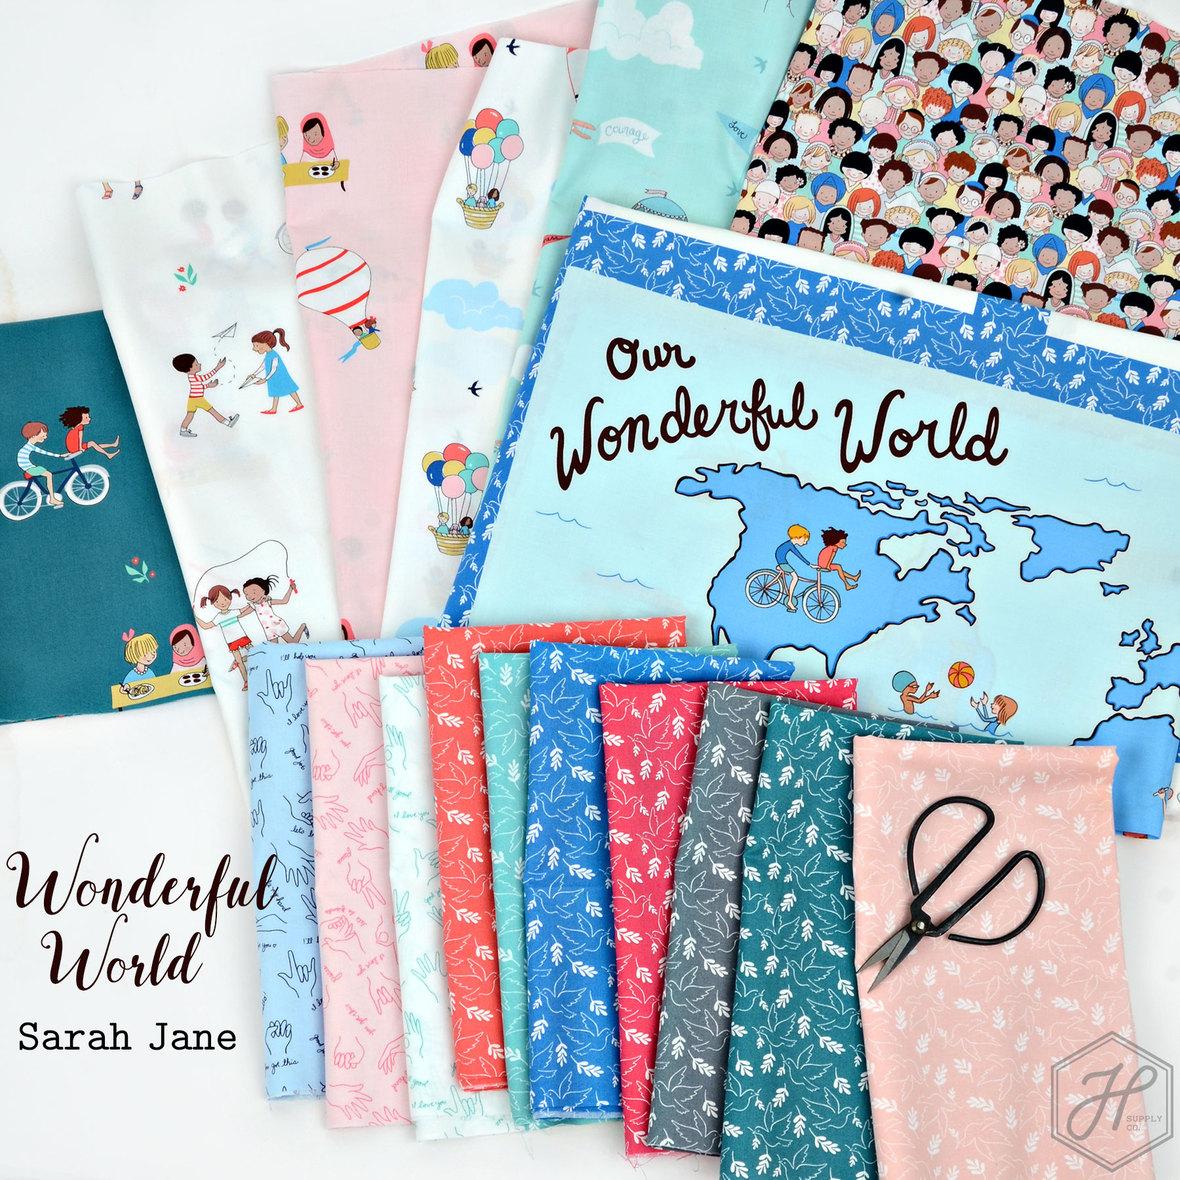 Wonderful-World-Fabric-Sarah-Jane-for-Michael-Miller-at-Hawthorne-Supply-Co.